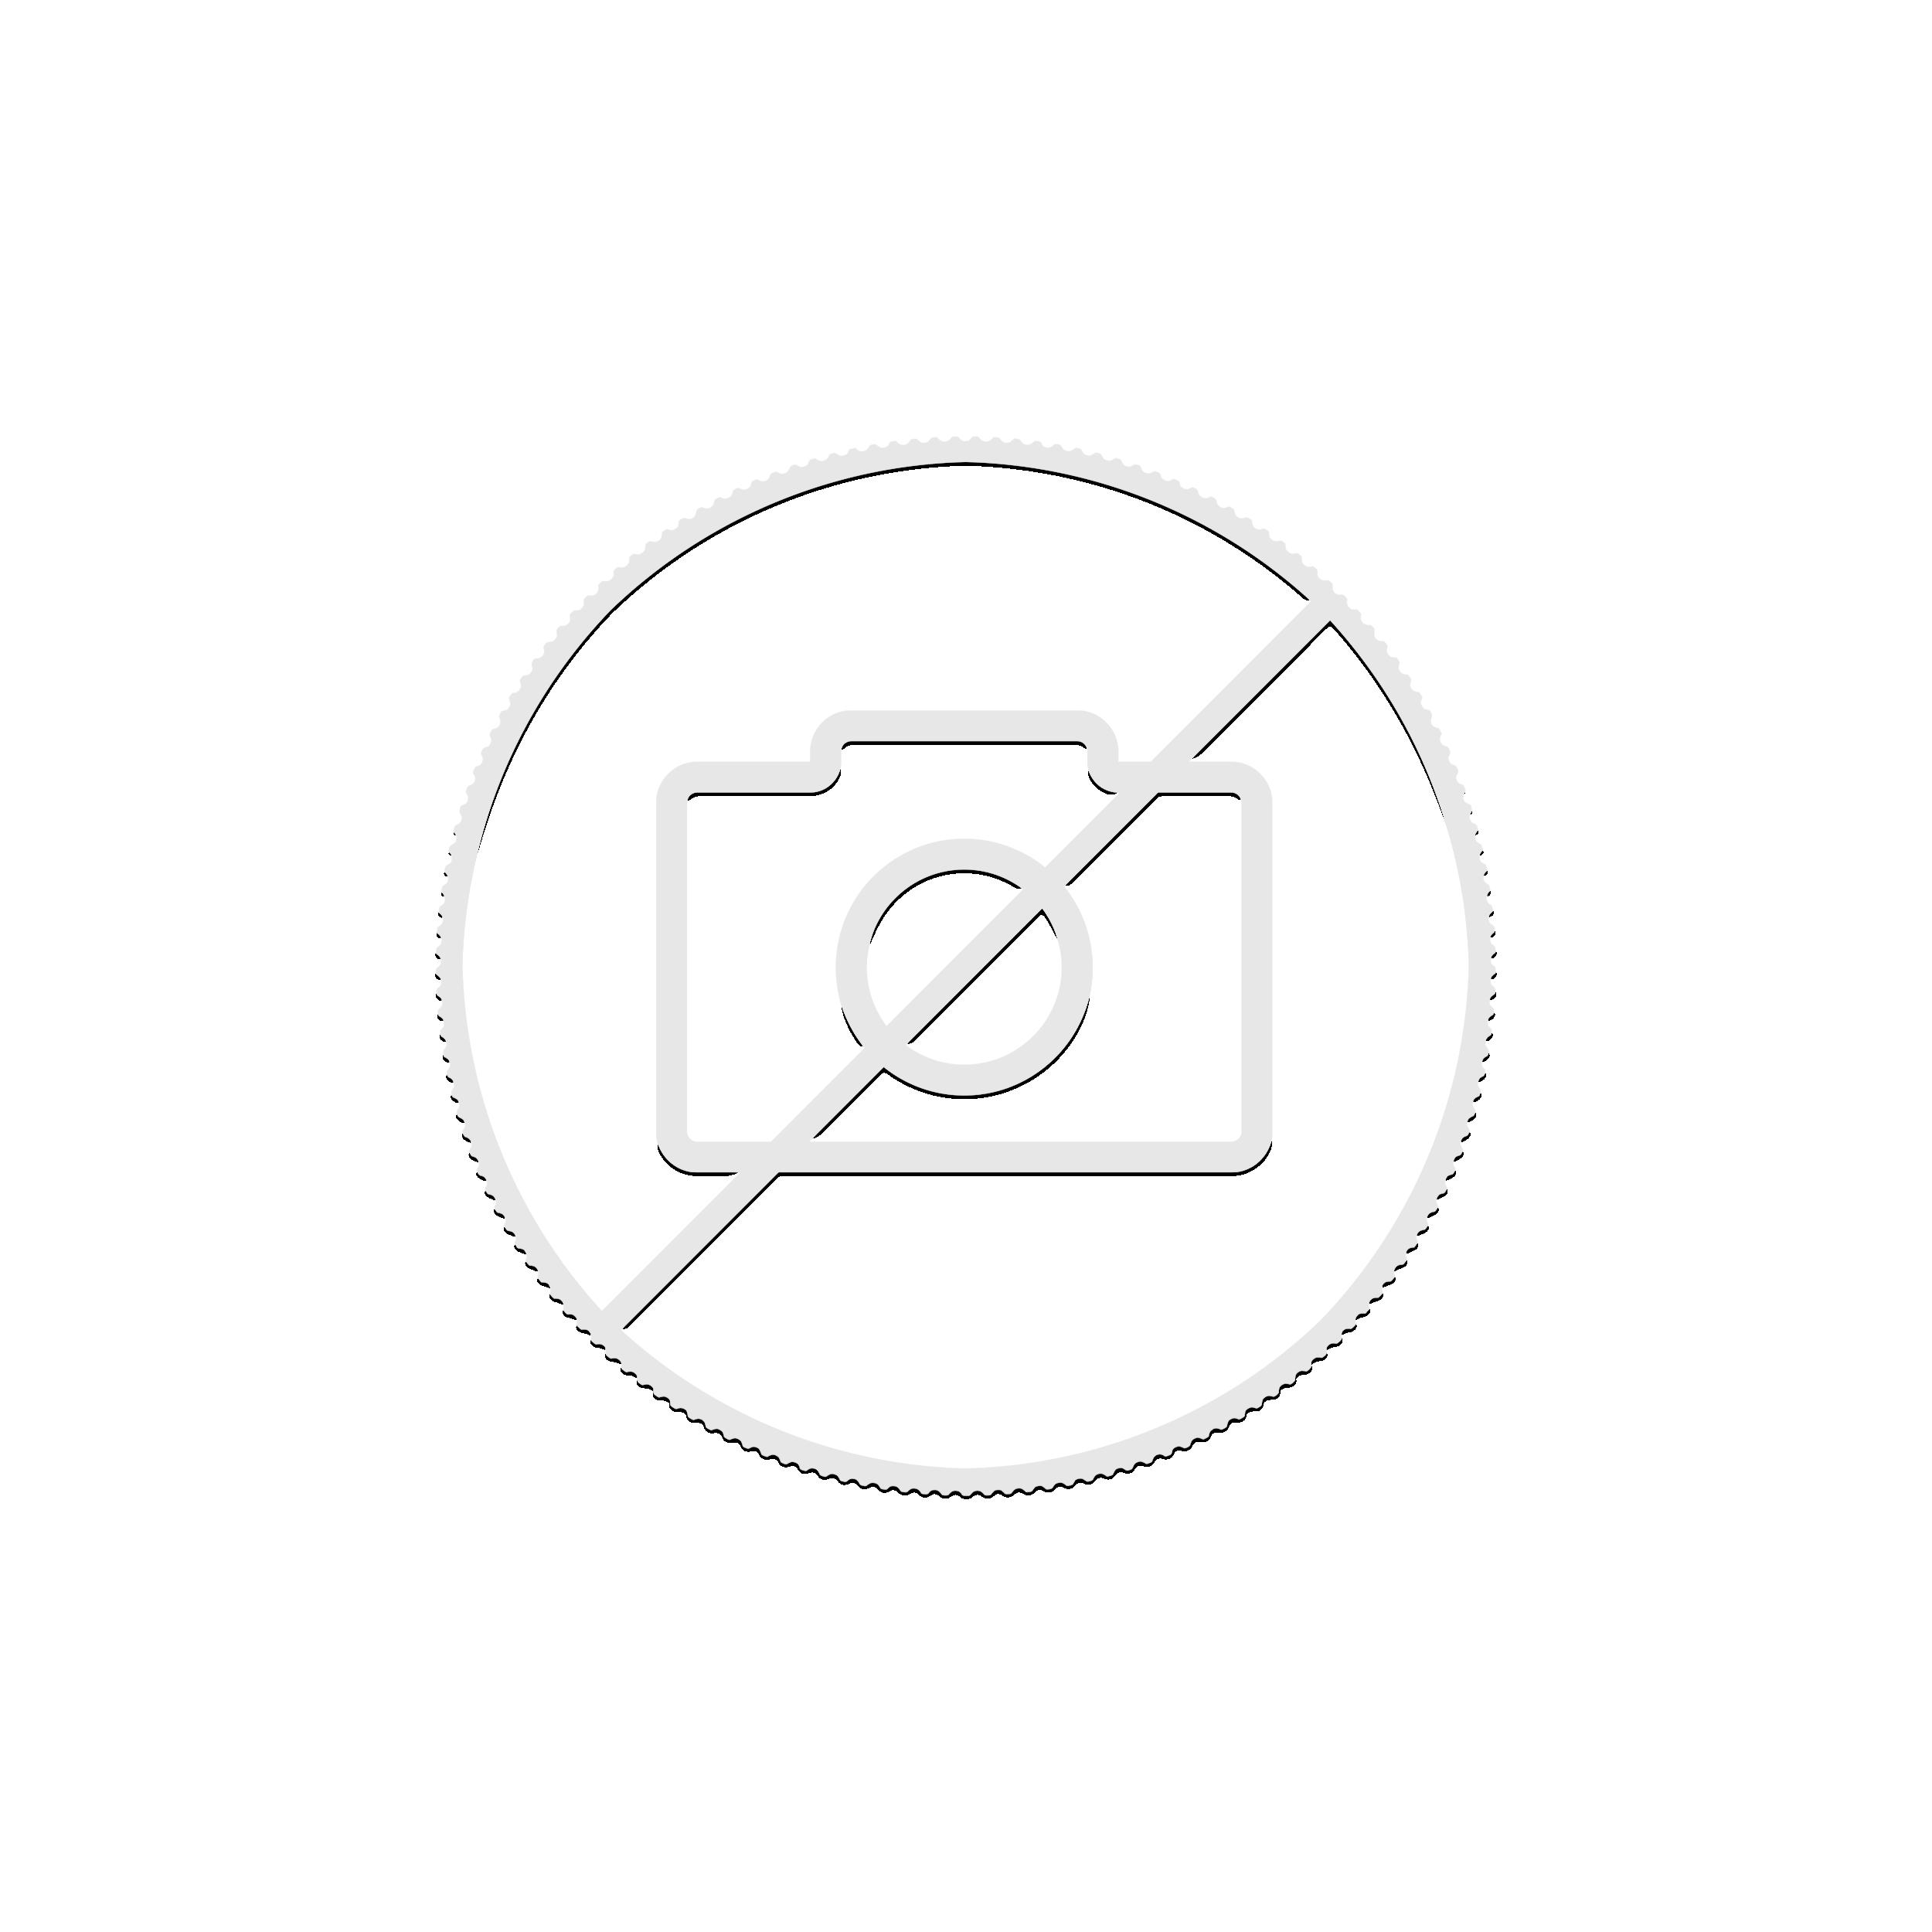 1 troy ounce zilveren Philharmoniker munt 2021